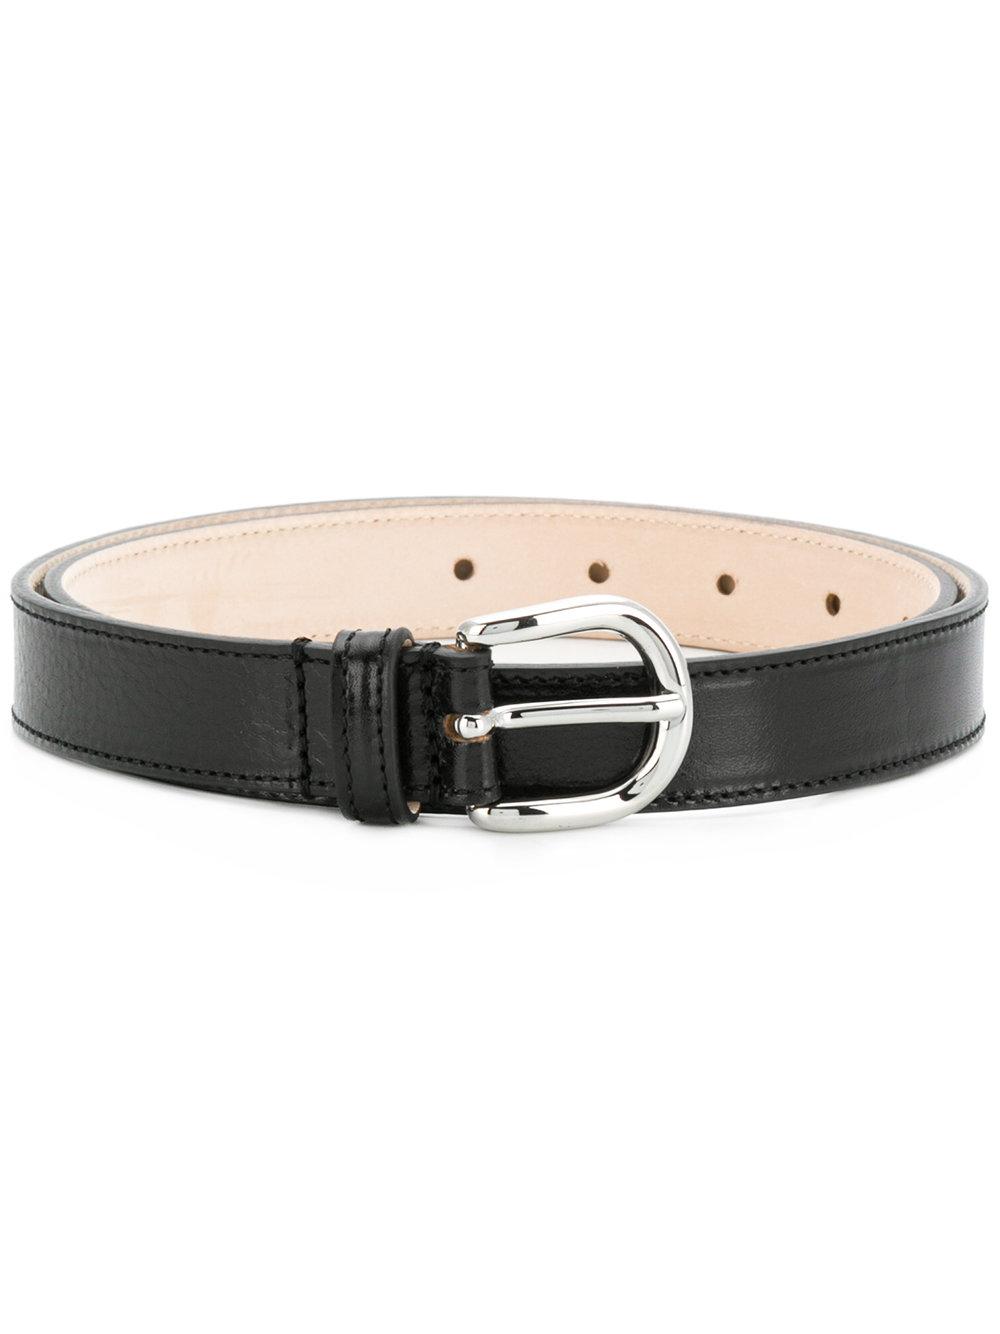 ea6f56031a42 Isabel Marant Zap belt - Black - Glami.sk